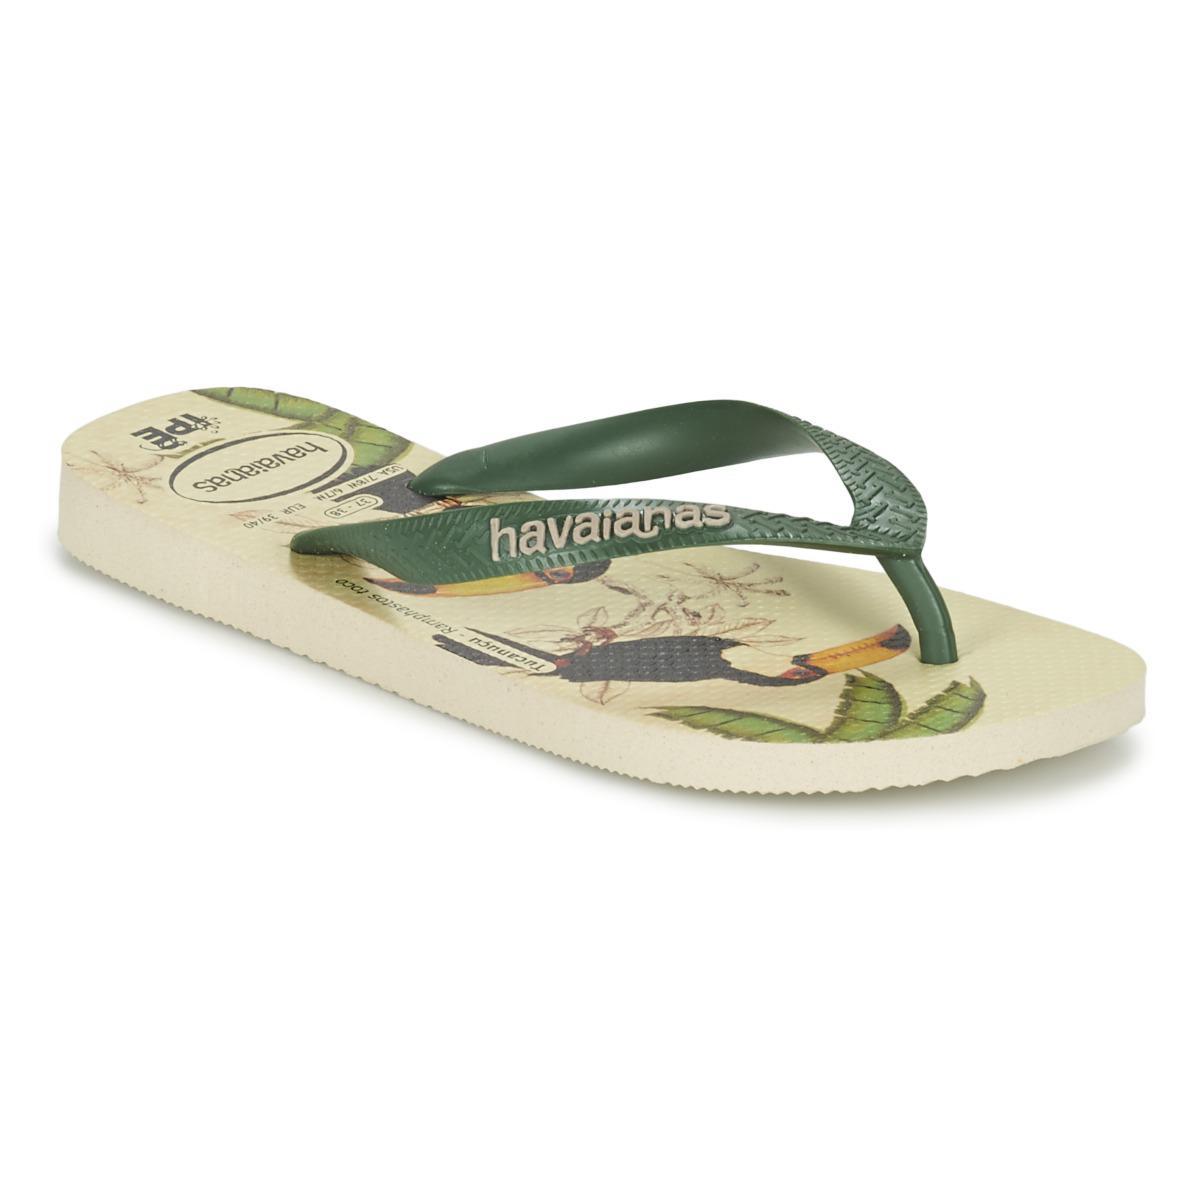 3b3e9c6f3 Havaianas Ipe Women s Flip Flops   Sandals (shoes) In Beige in ...